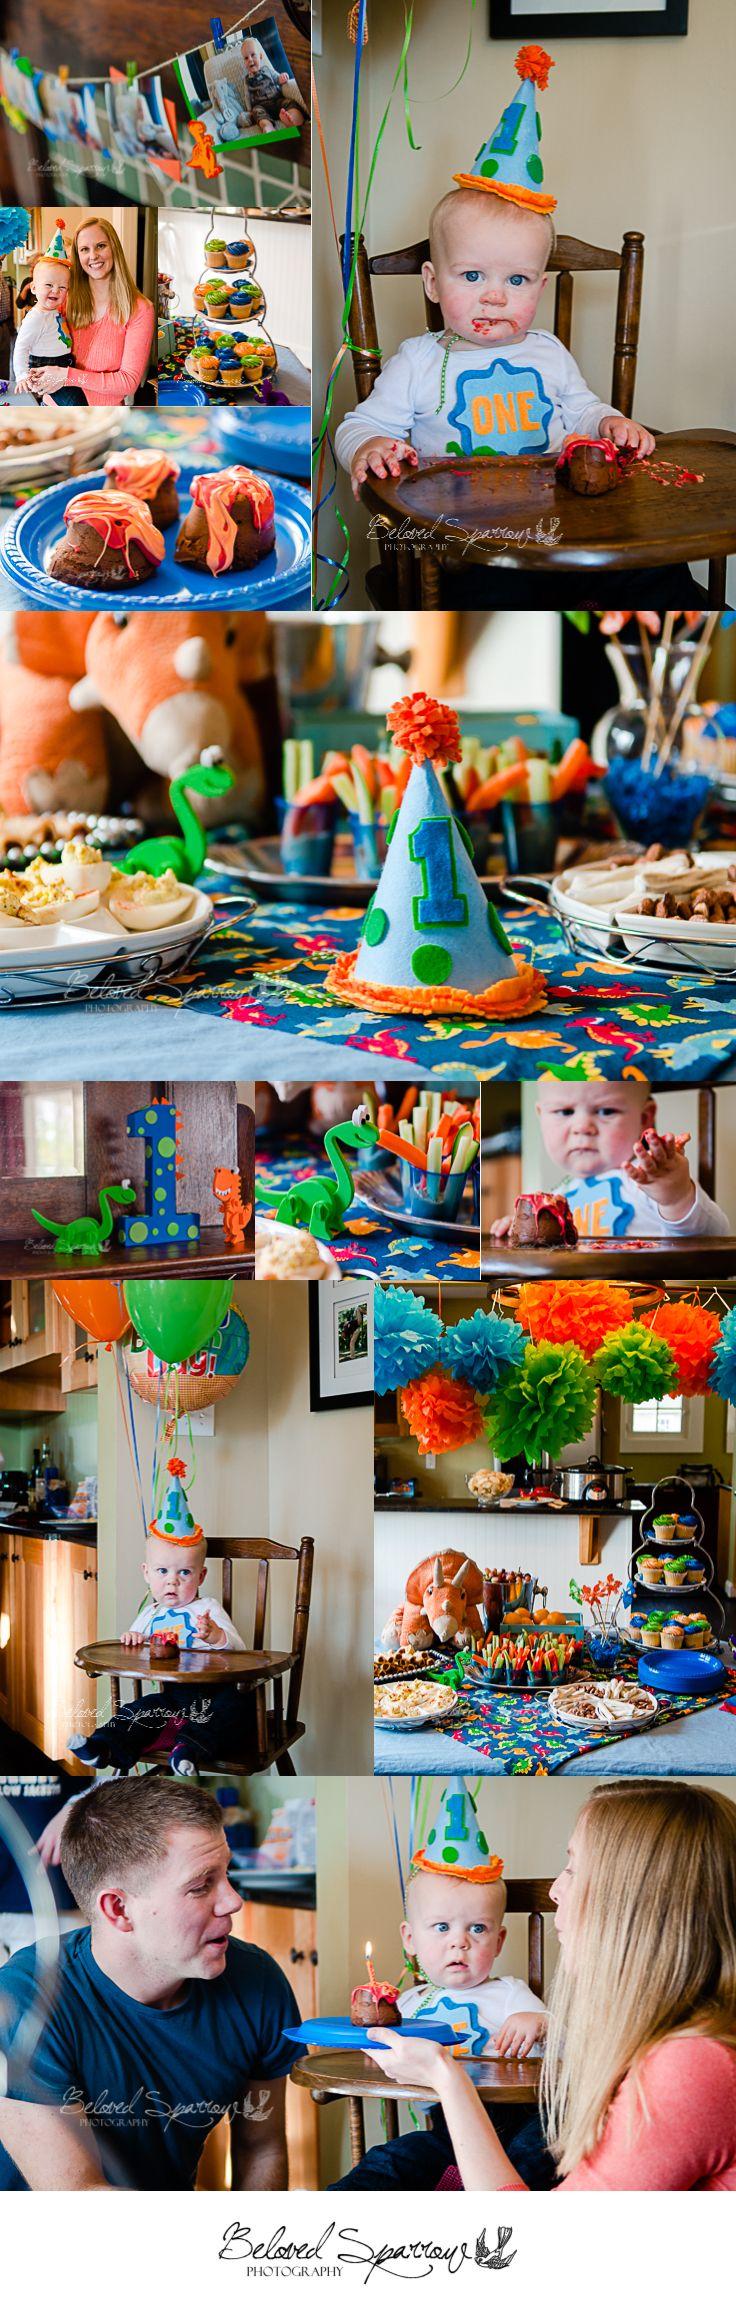 Metro Atlanta First Birthday Photographer  |  Beloved Sparrow Photography  |  Peachtree City Georgia  |  Dinosaur Birthday Party  |  Toddler Boy Birthday Party  |  Orange Blue Green www.belovedsparrow.com